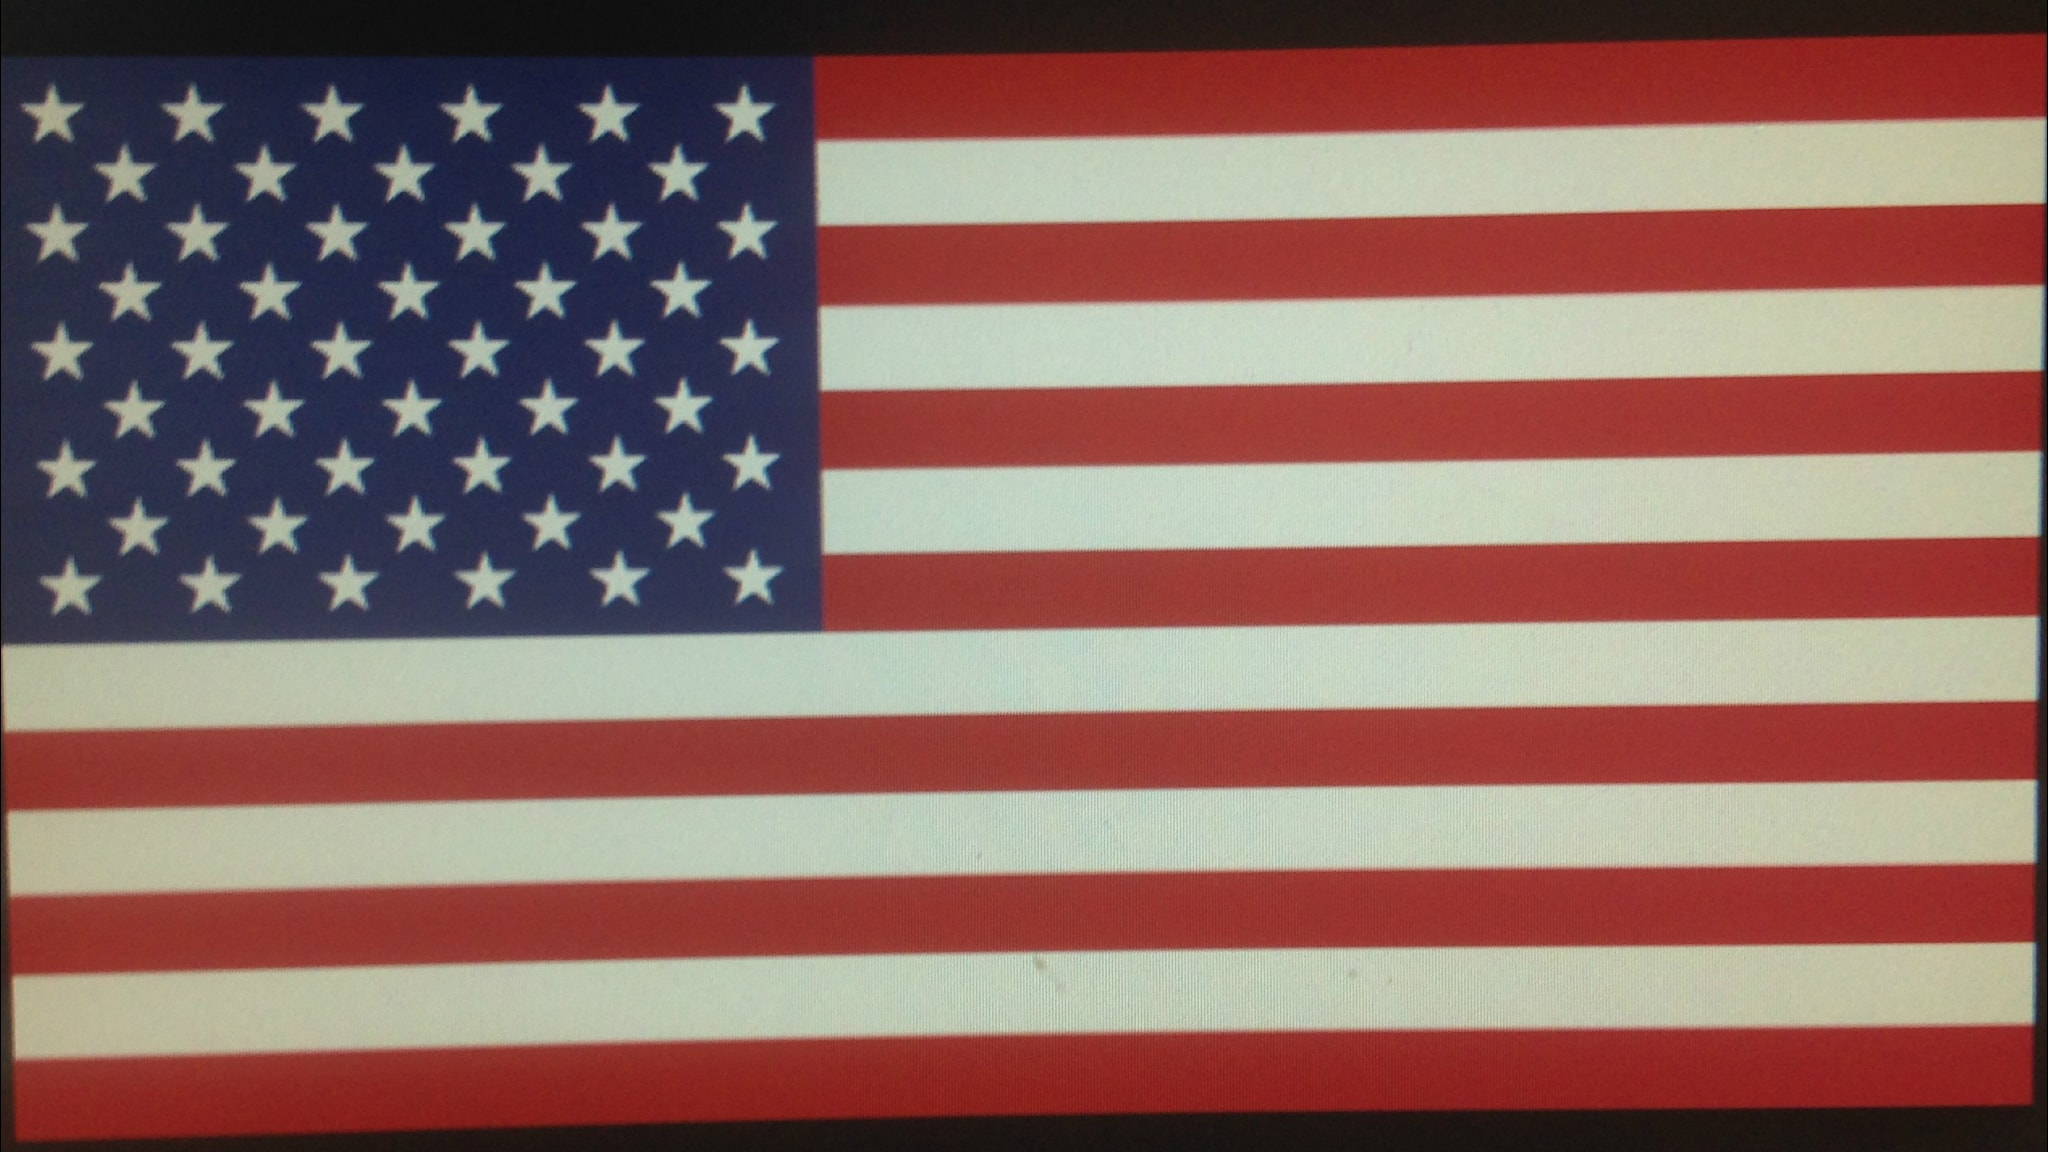 Amerikka, ihmemaa vai ihme maa?